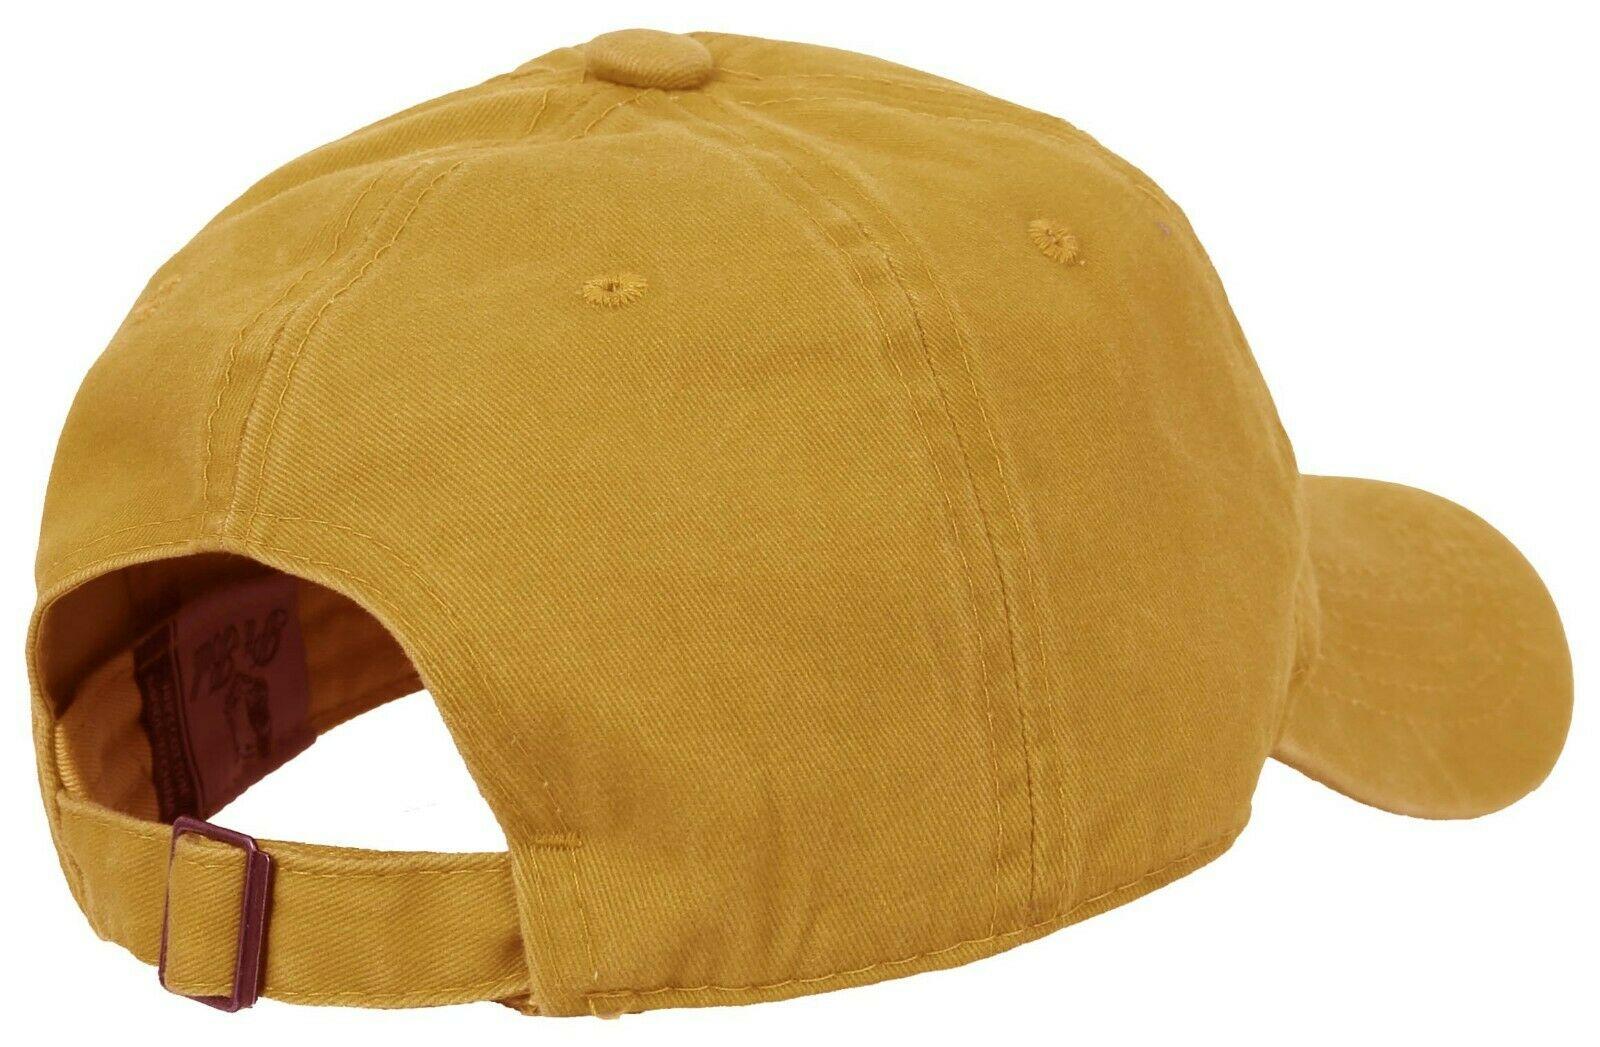 BASEBALL-CAP-Plain-Dad-Hat-Low-Profile-Vintage-Washed-Pigment-Adjustable thumbnail 25